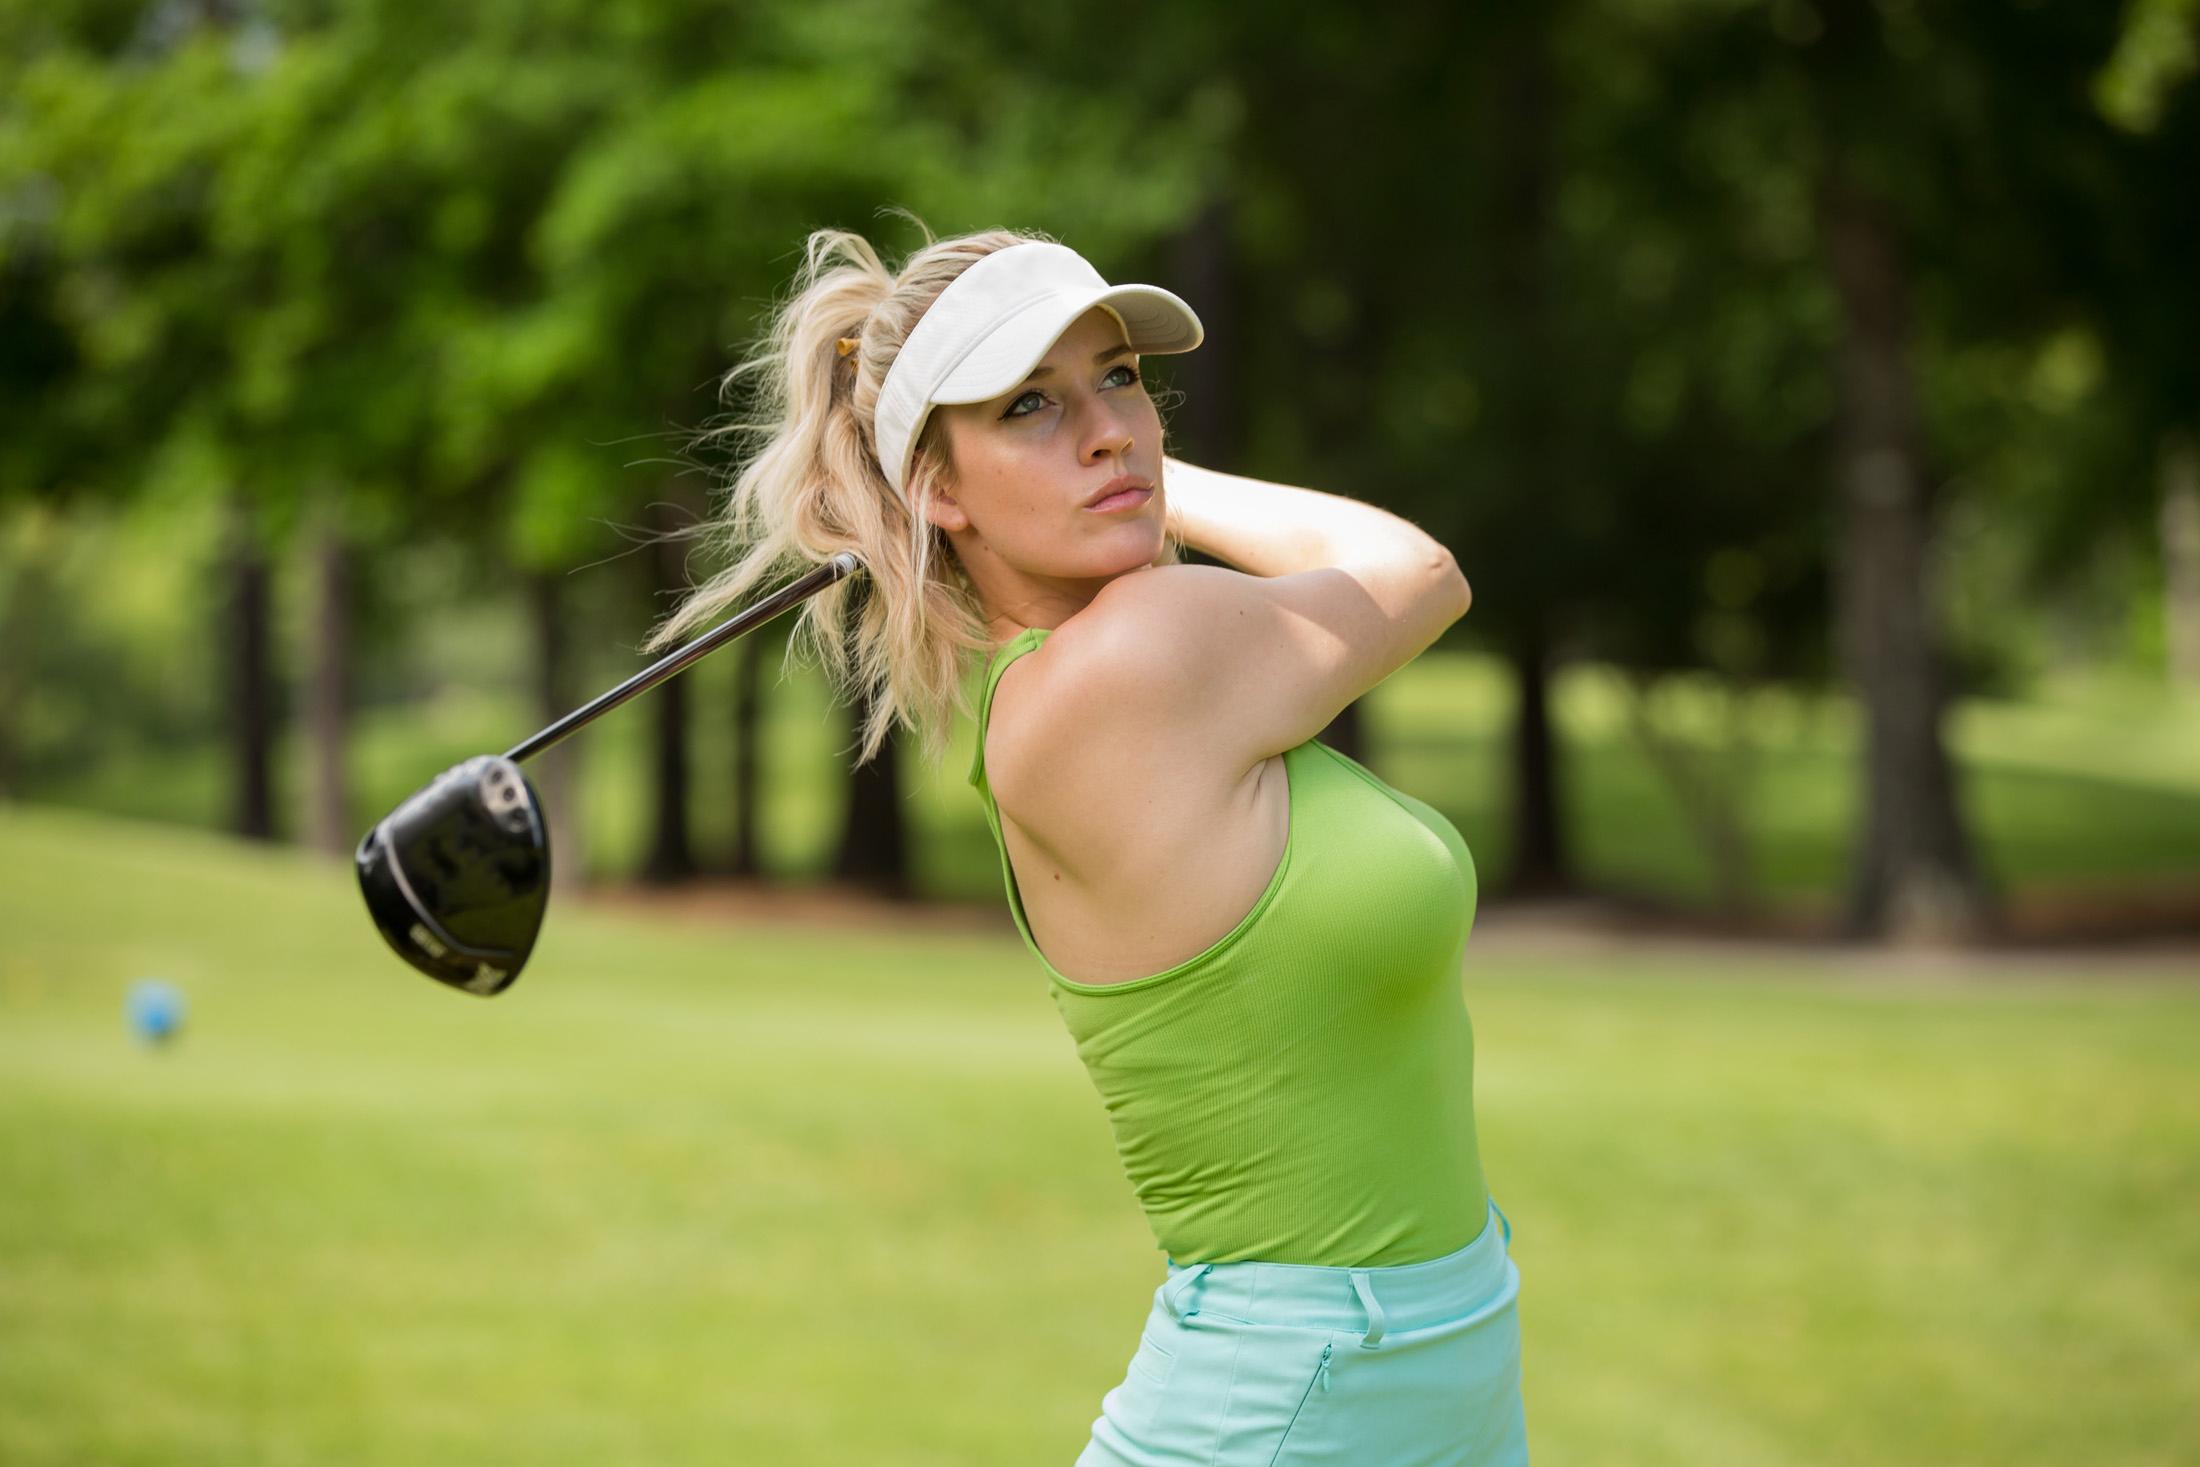 Paige Spiranac golf swing